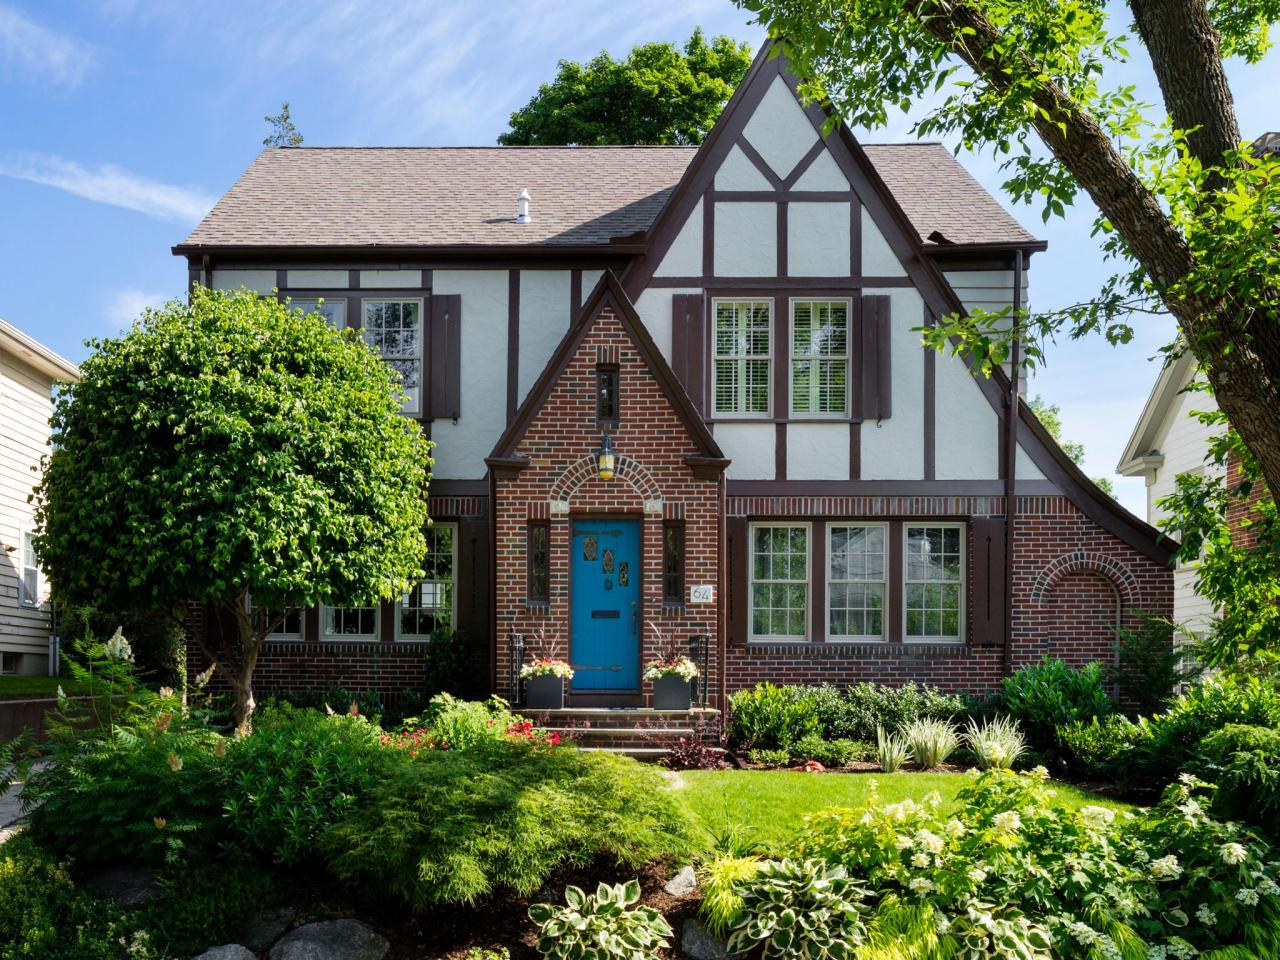 Tudor house with blue door hgtv for Blue house builders